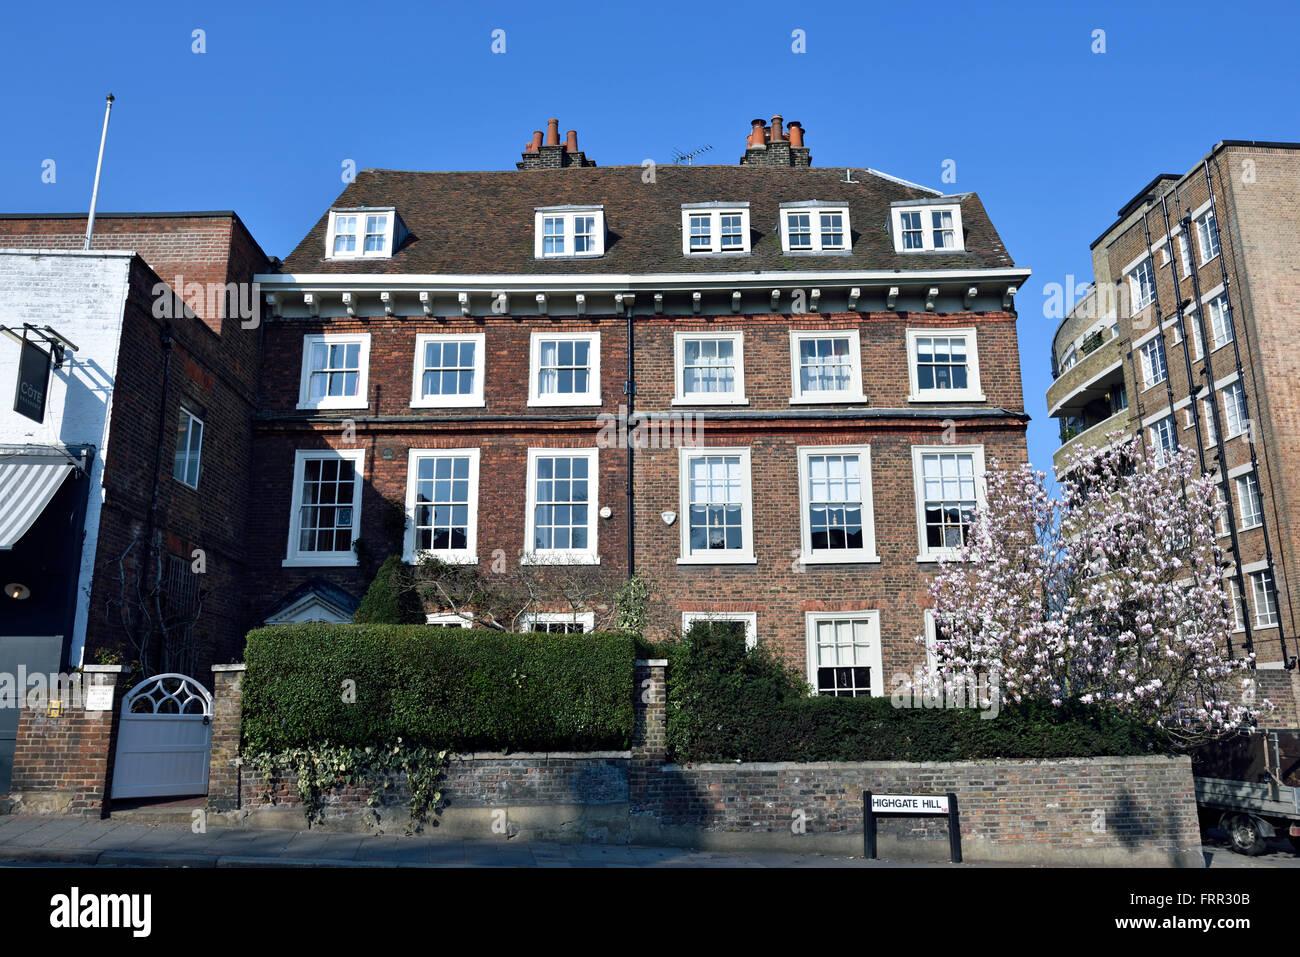 Two Georgian houses on Highgate Hill London England Britain UK - Stock Image